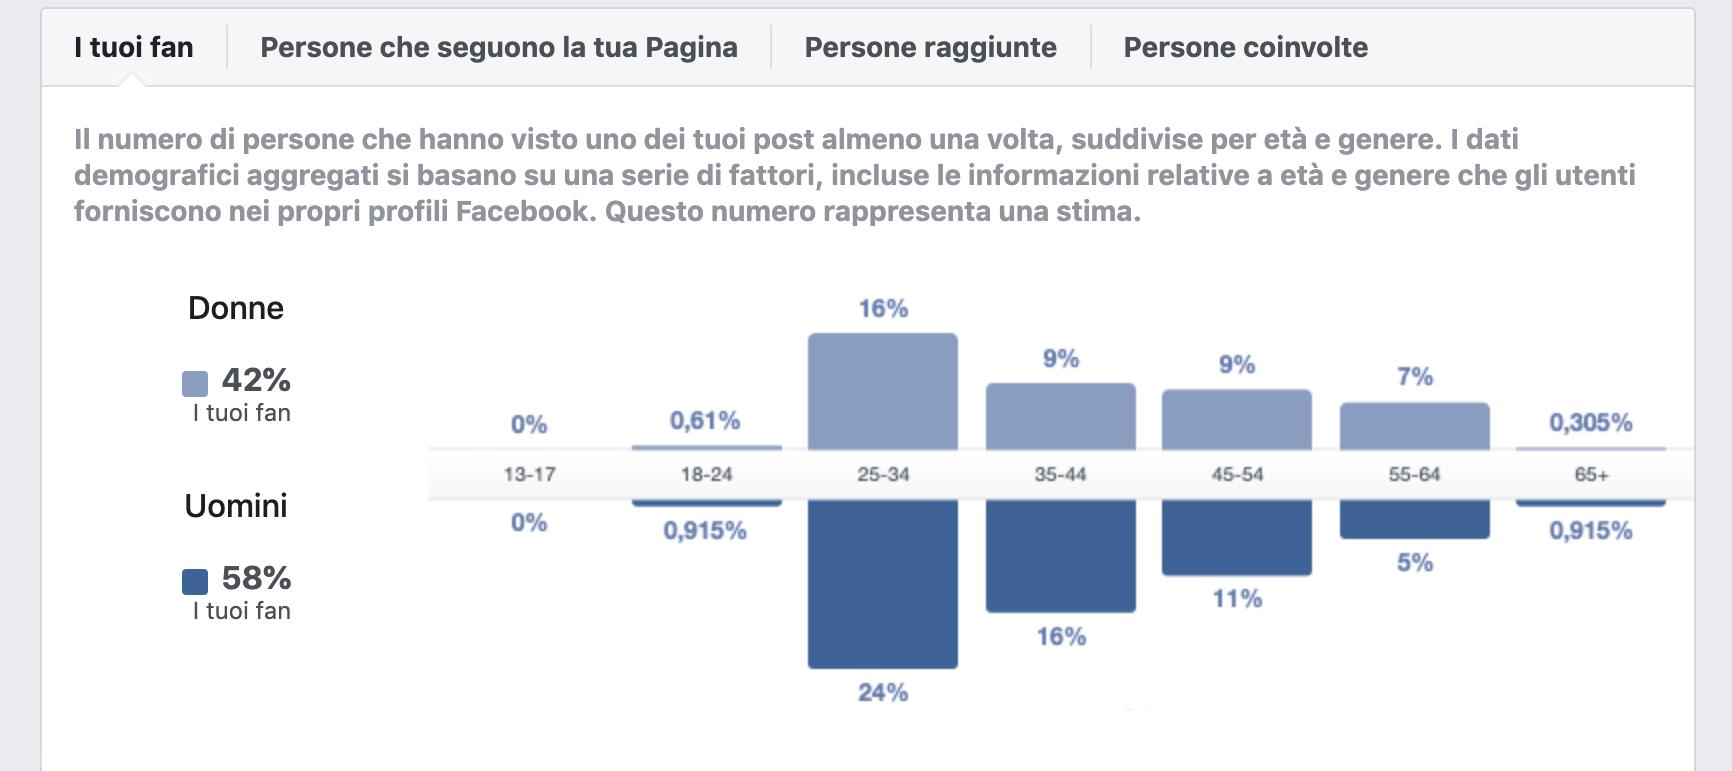 facebook-persona-dati-nel-marketing-sanitario